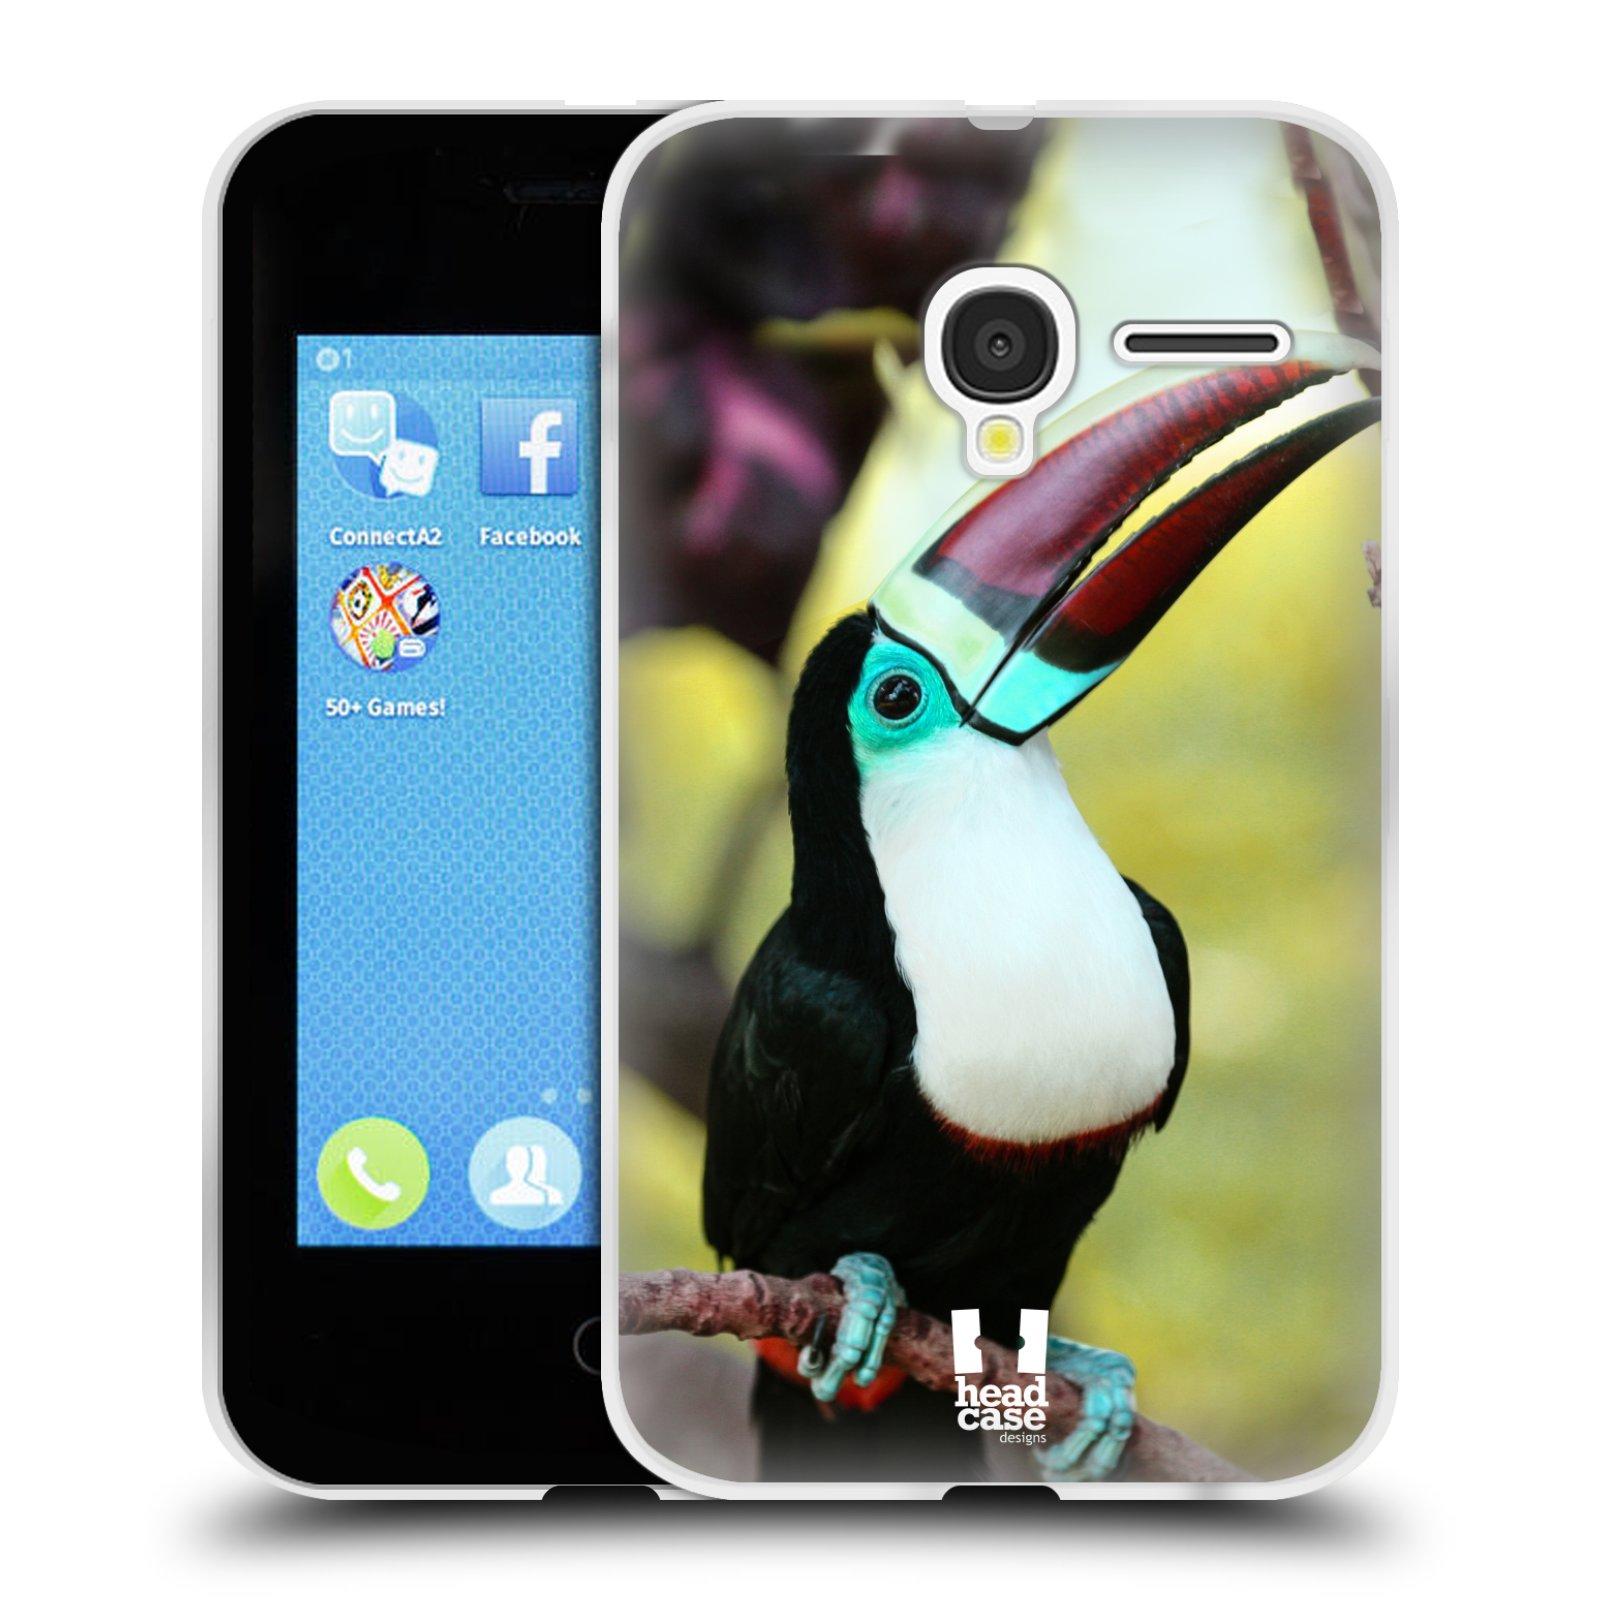 HEAD CASE silikonový obal na mobil Alcatel PIXI 3 OT-4022D (3,5 palcový displej) vzor slavná zvířata foto tukan